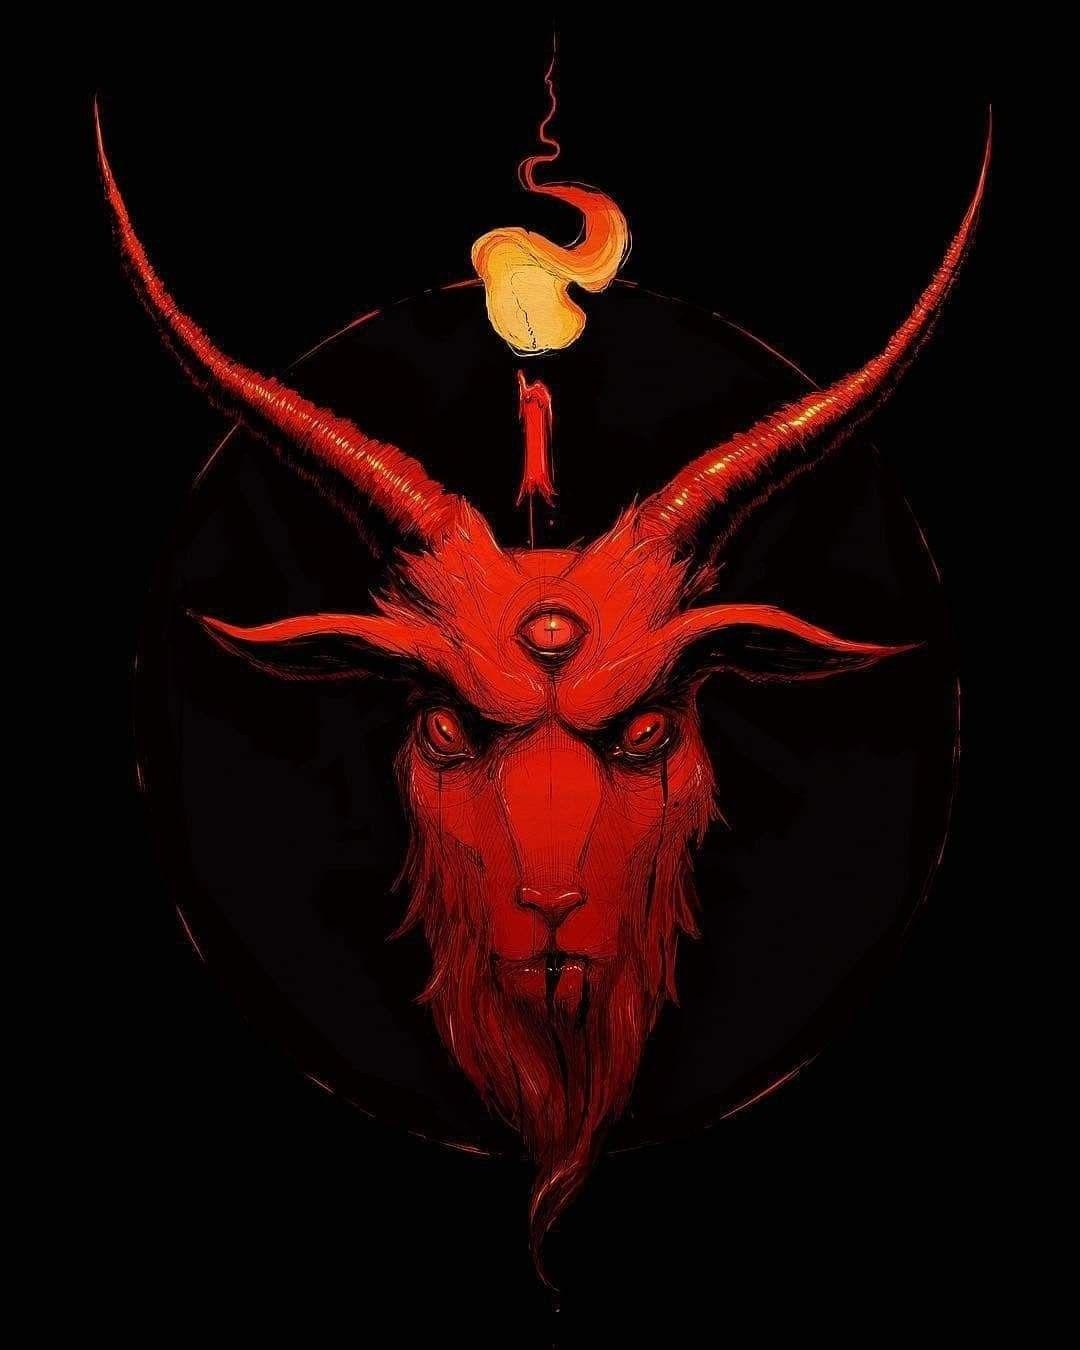 Pin on My Uploads - Satanic Related Things